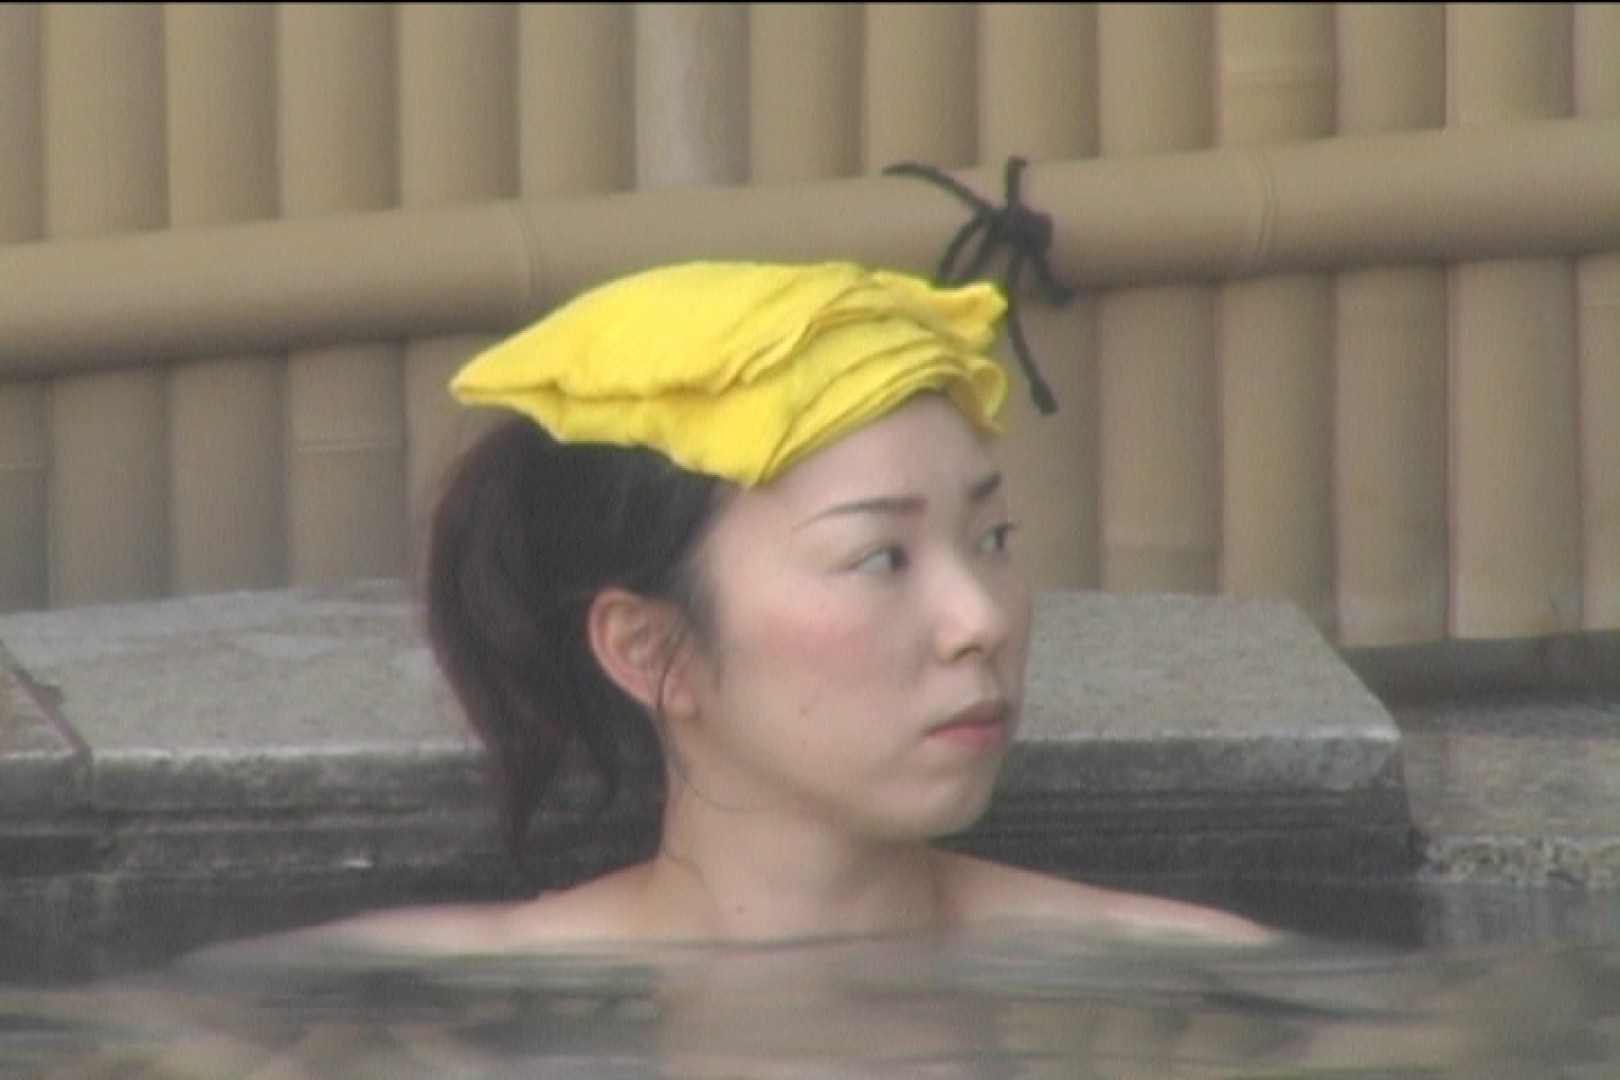 Aquaな露天風呂Vol.529 盗撮映像  51Pix 20